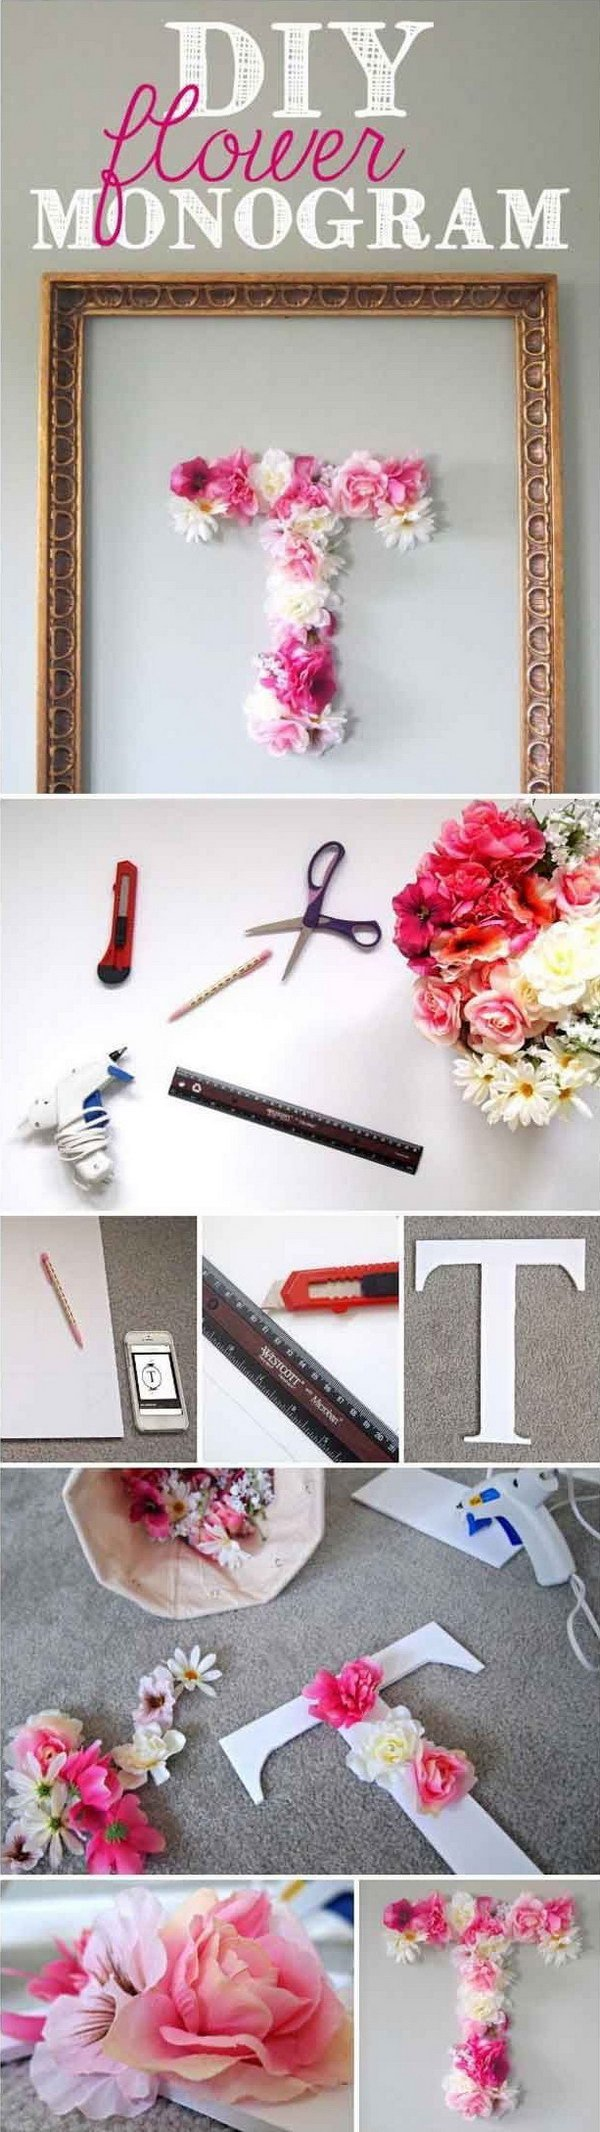 Diy Room Decor for Teenagers Inspirational 25 Diy Ideas & Tutorials for Teenage Girl S Room Decoration 2017